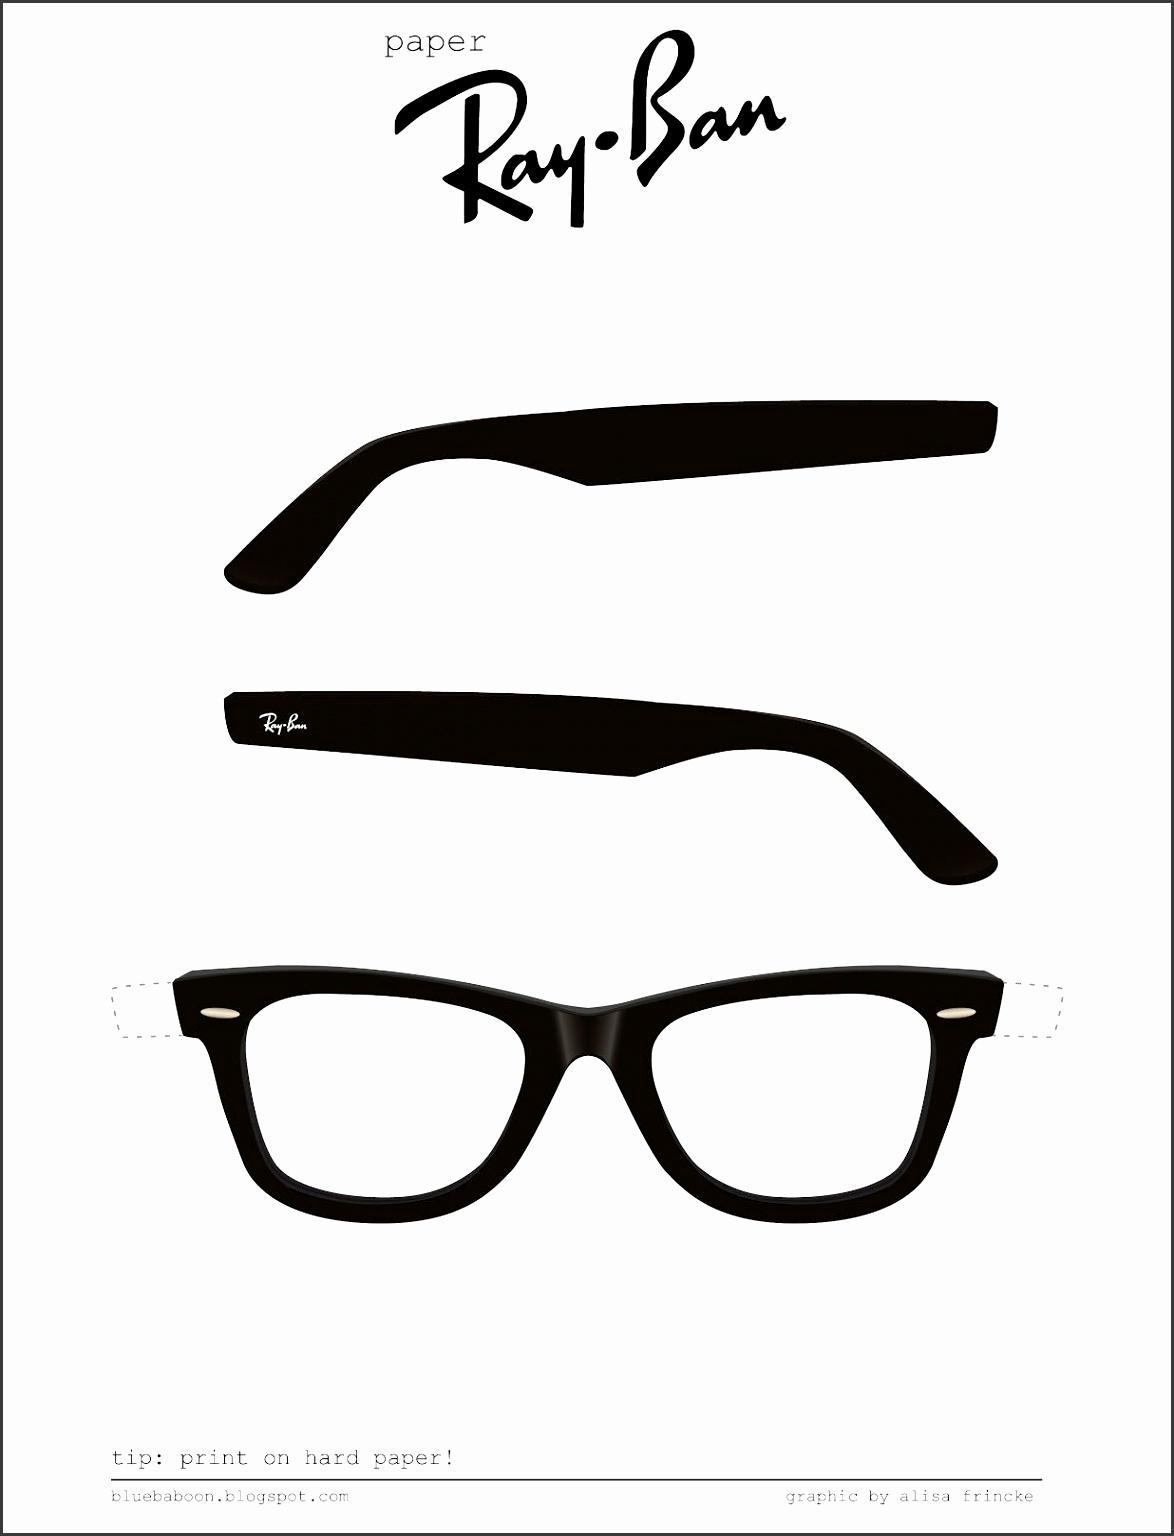 blue baboon paper Ray Ban glasses YEEEEESSSSSSS